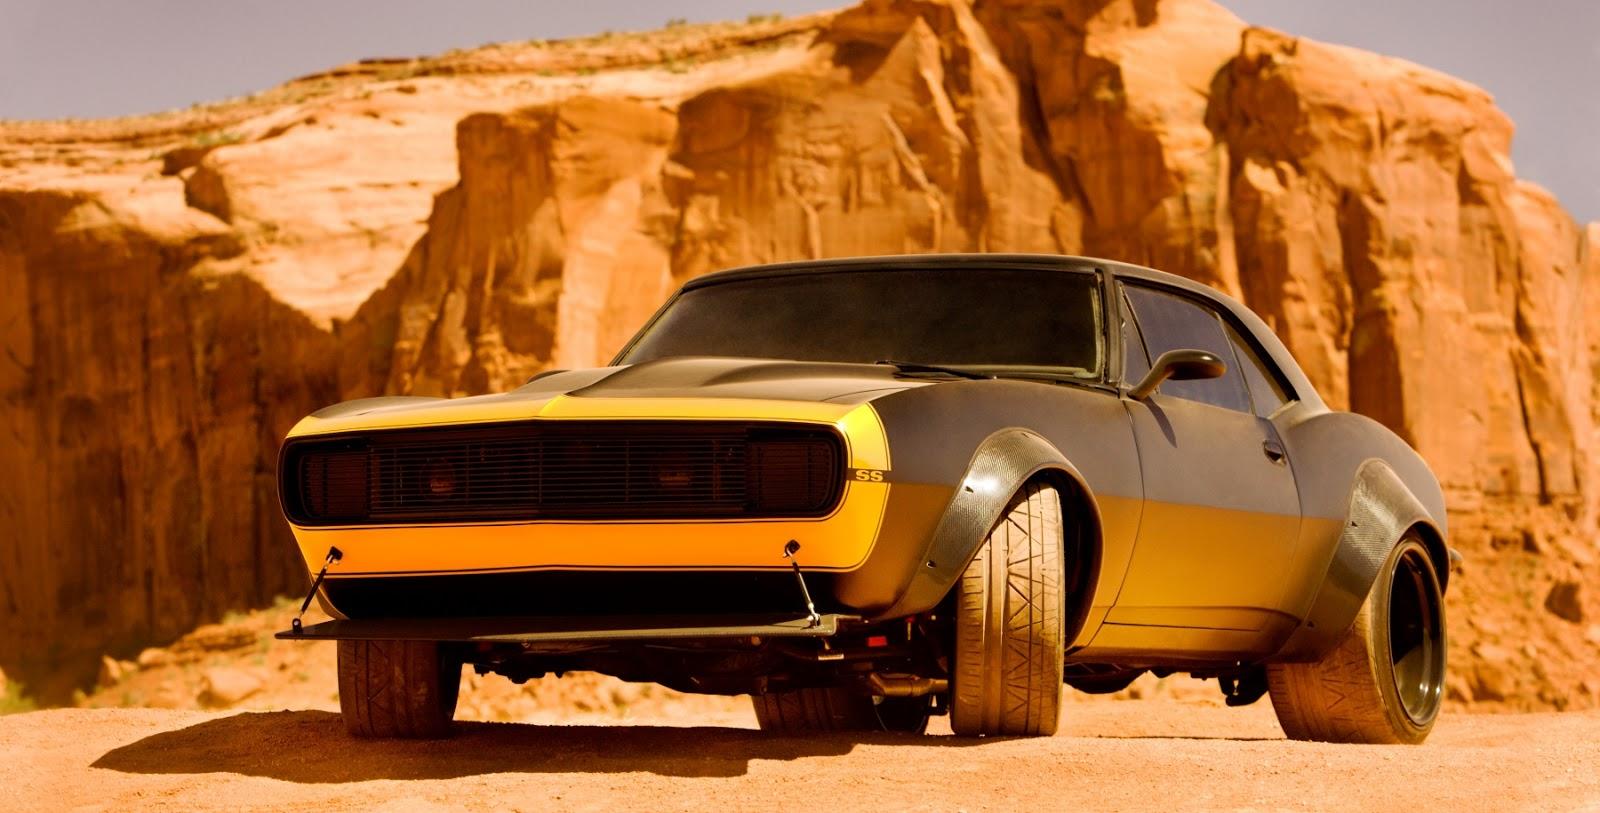 Bumblebee Becomes 1967 Camaro in Transformers 4  autoevolution